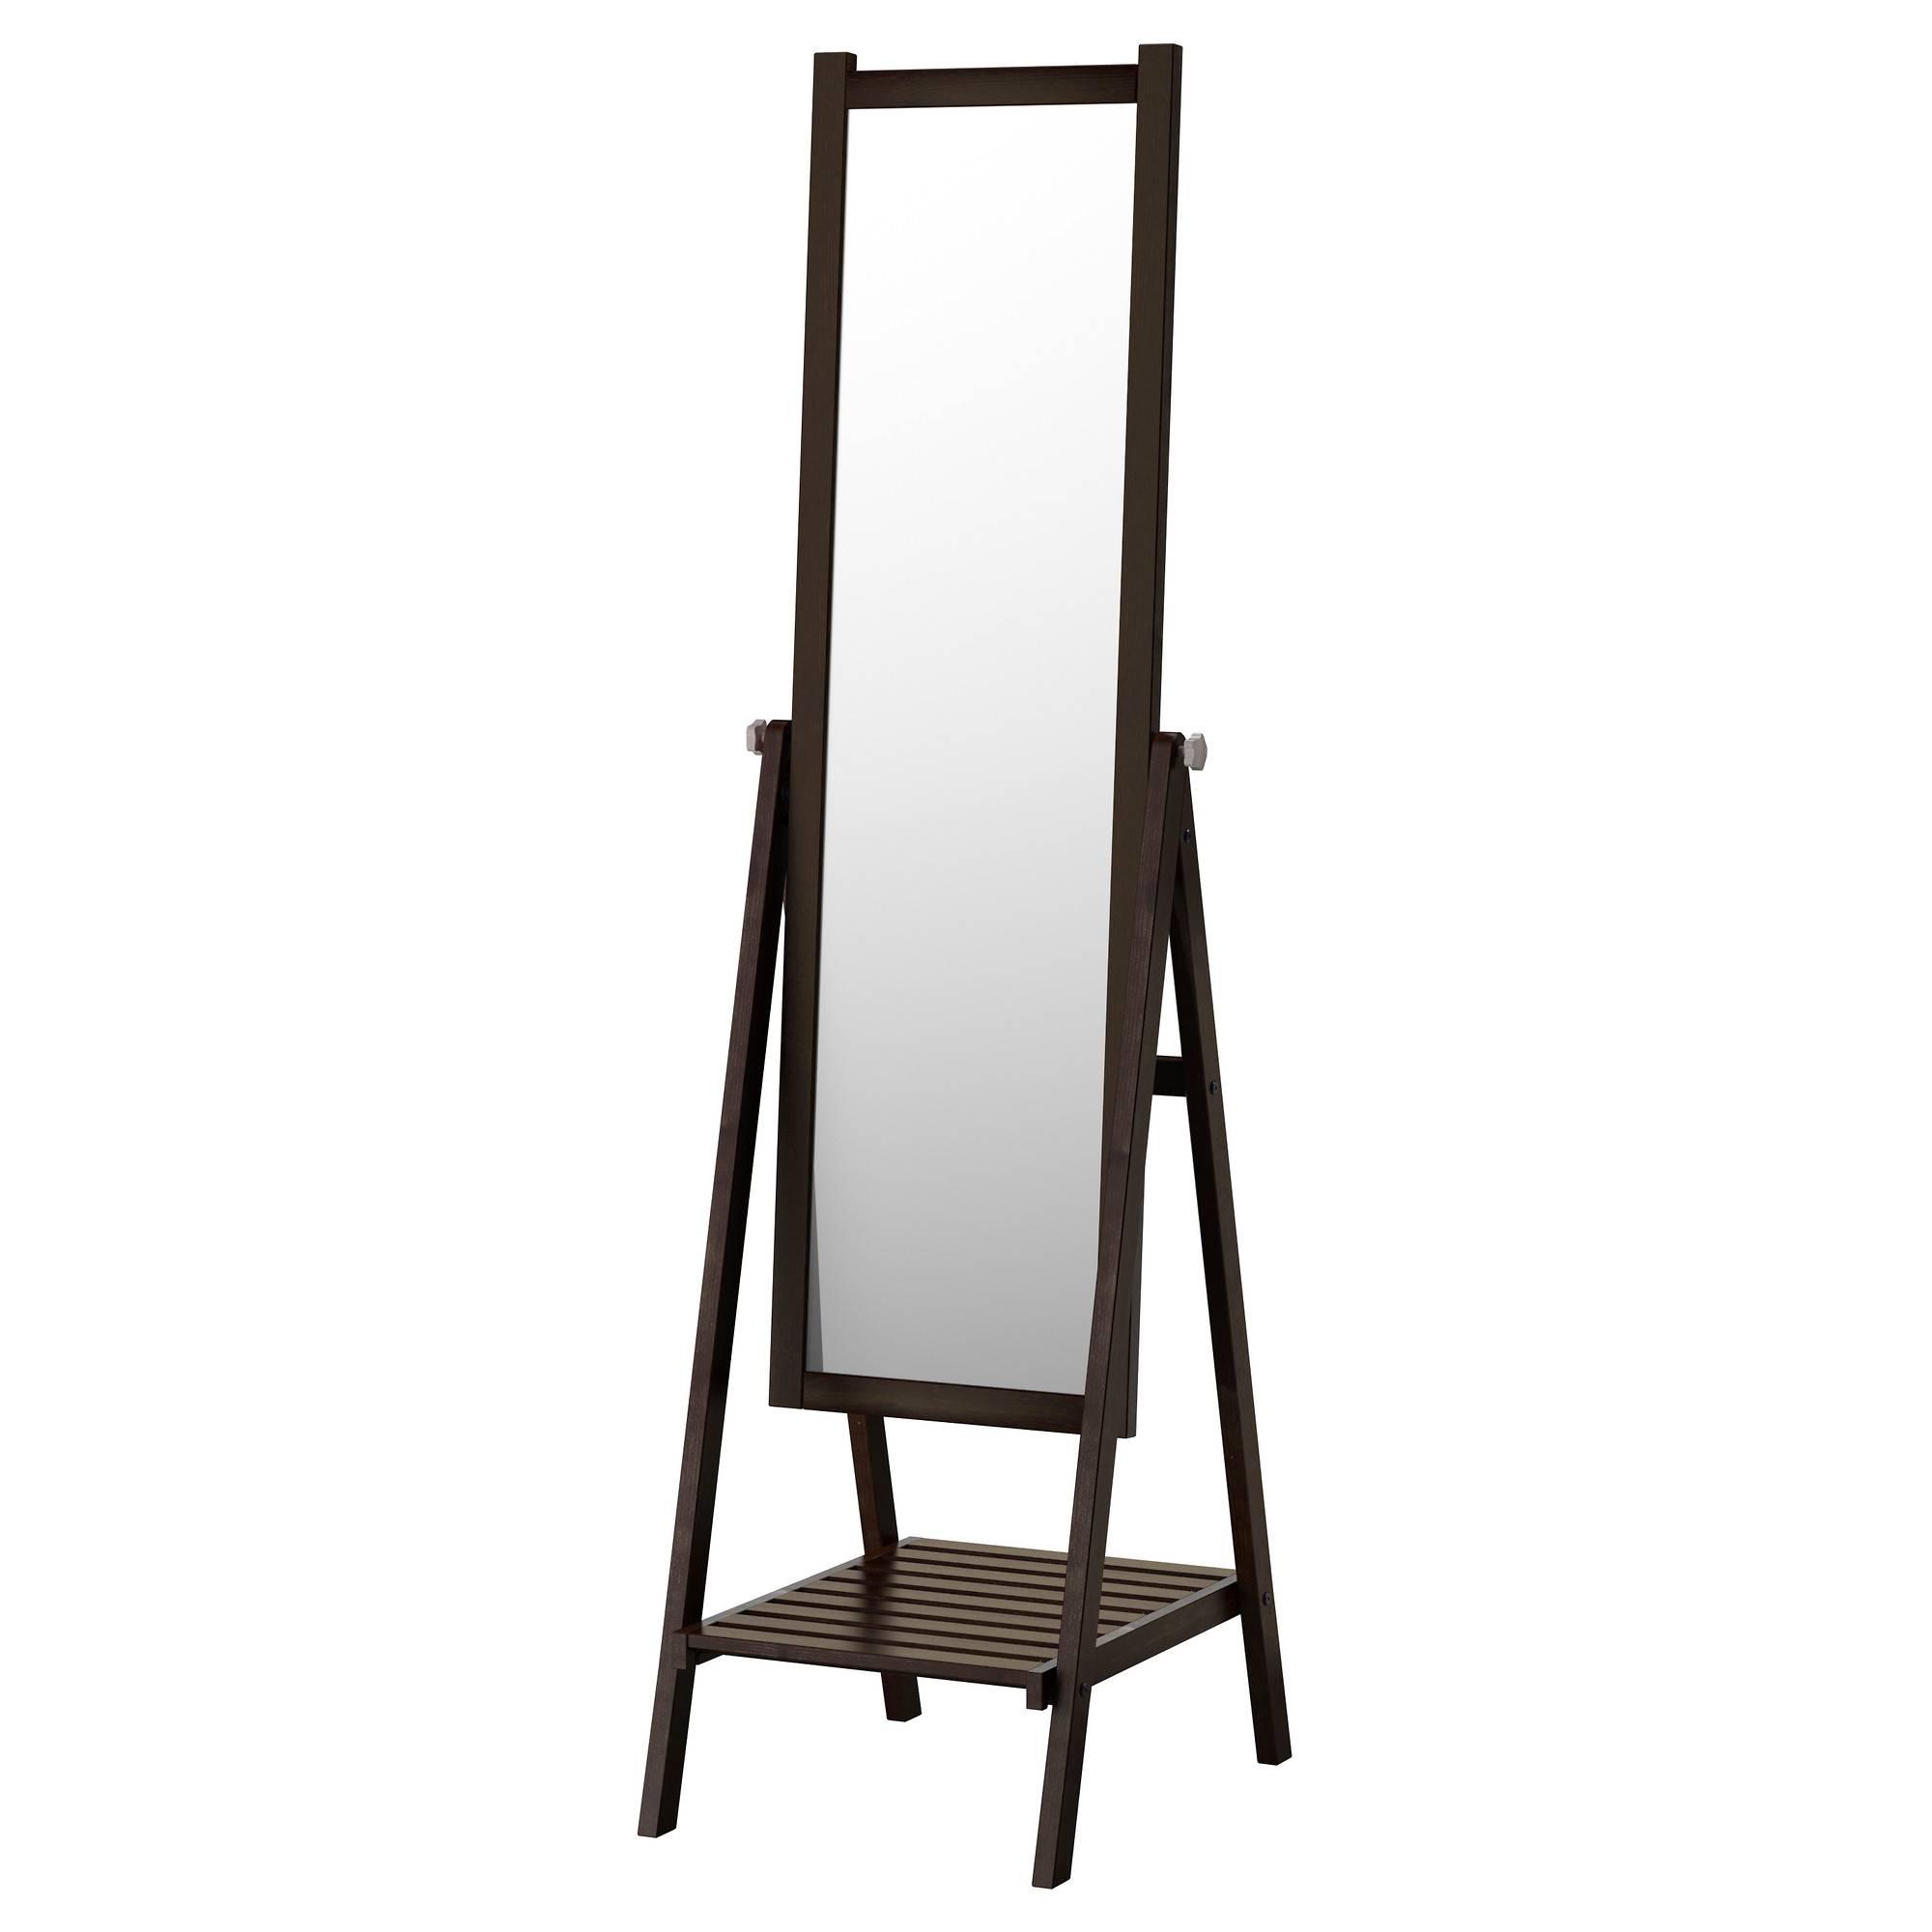 Mirrors - Ikea regarding Long Narrow Mirrors (Image 14 of 25)